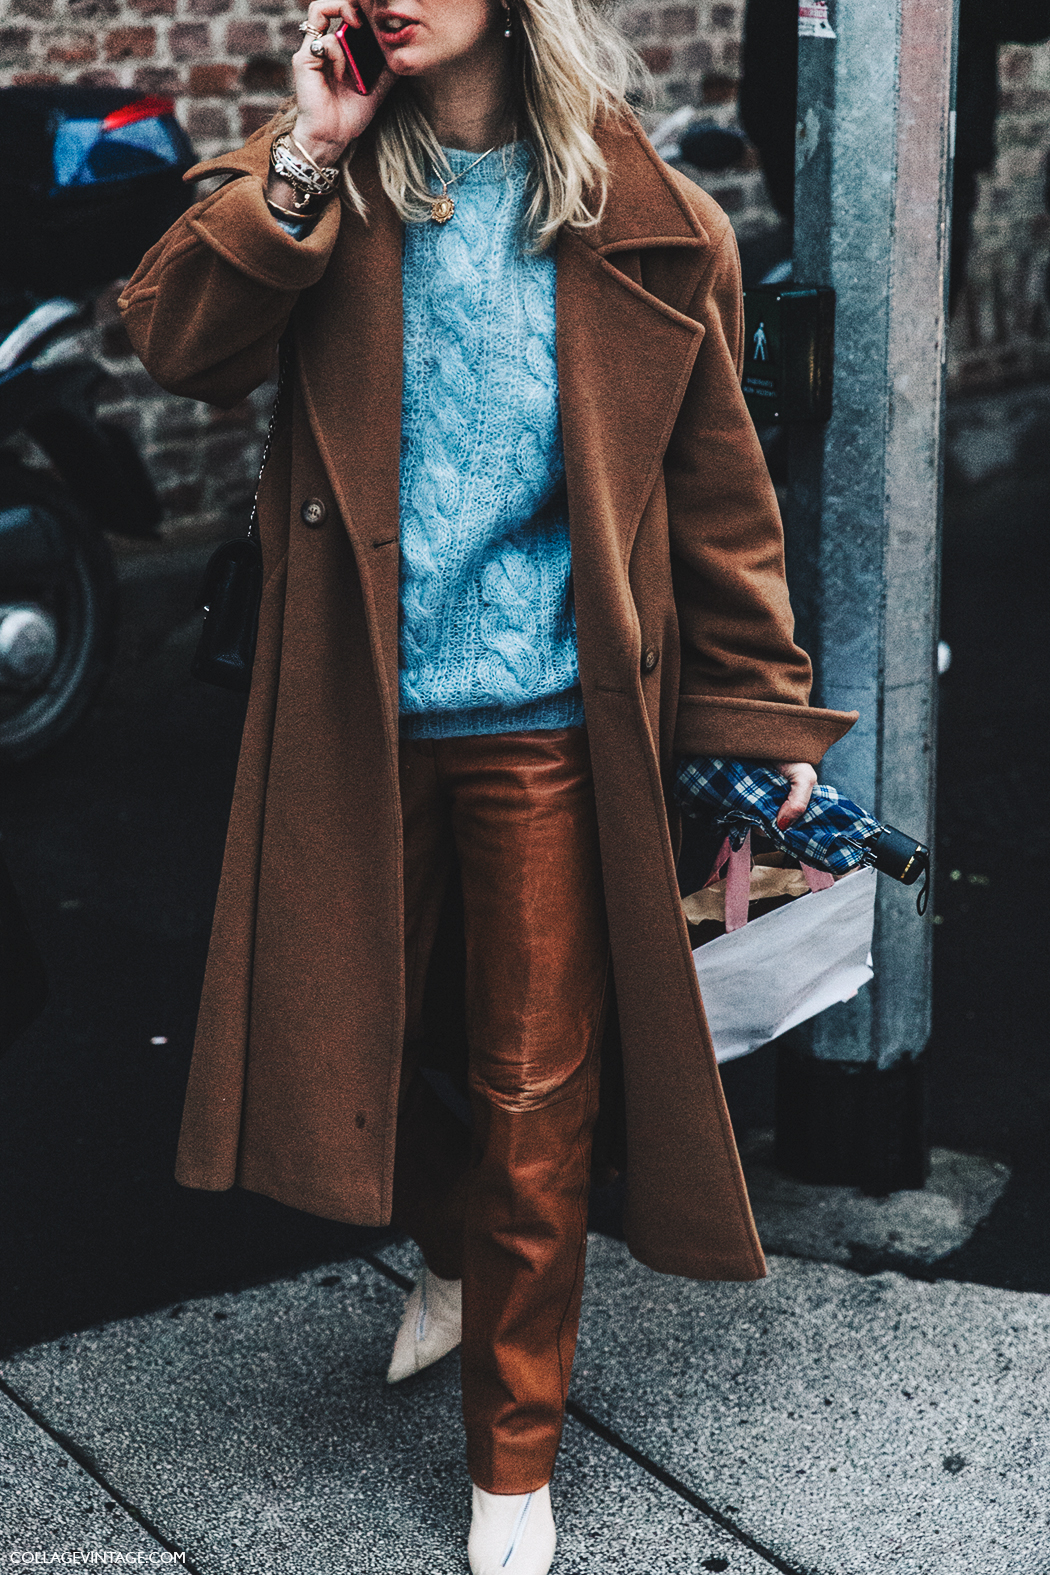 Milan_Fashion_Week_Fall_16-MFW-Street_Style-Collage_Vintage-Camel_Coat-Light_Blue-